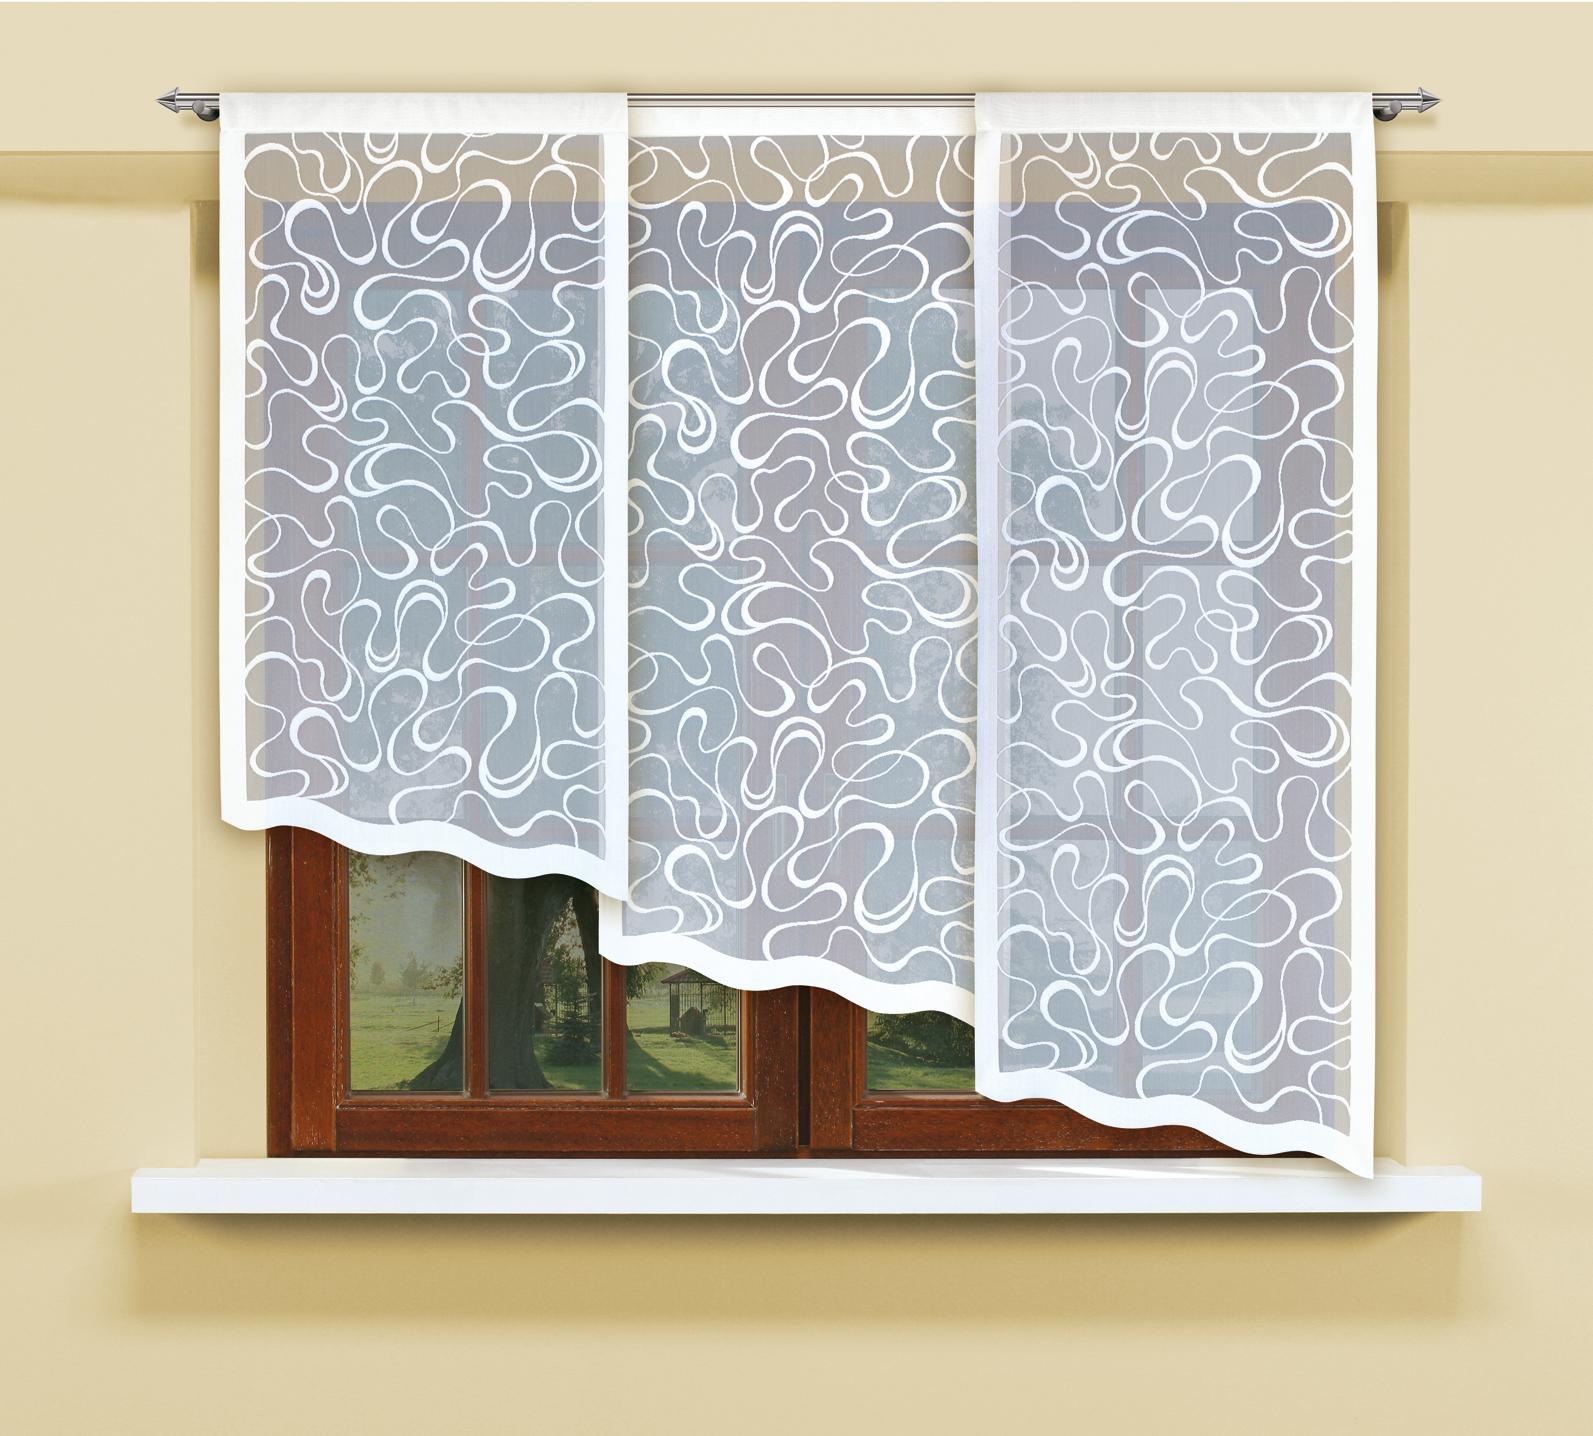 Комплект гардин Haft, на кулиске, цвет: белый, 3 шт. 207750 комплект гардин панно haft шторы светлые page 10